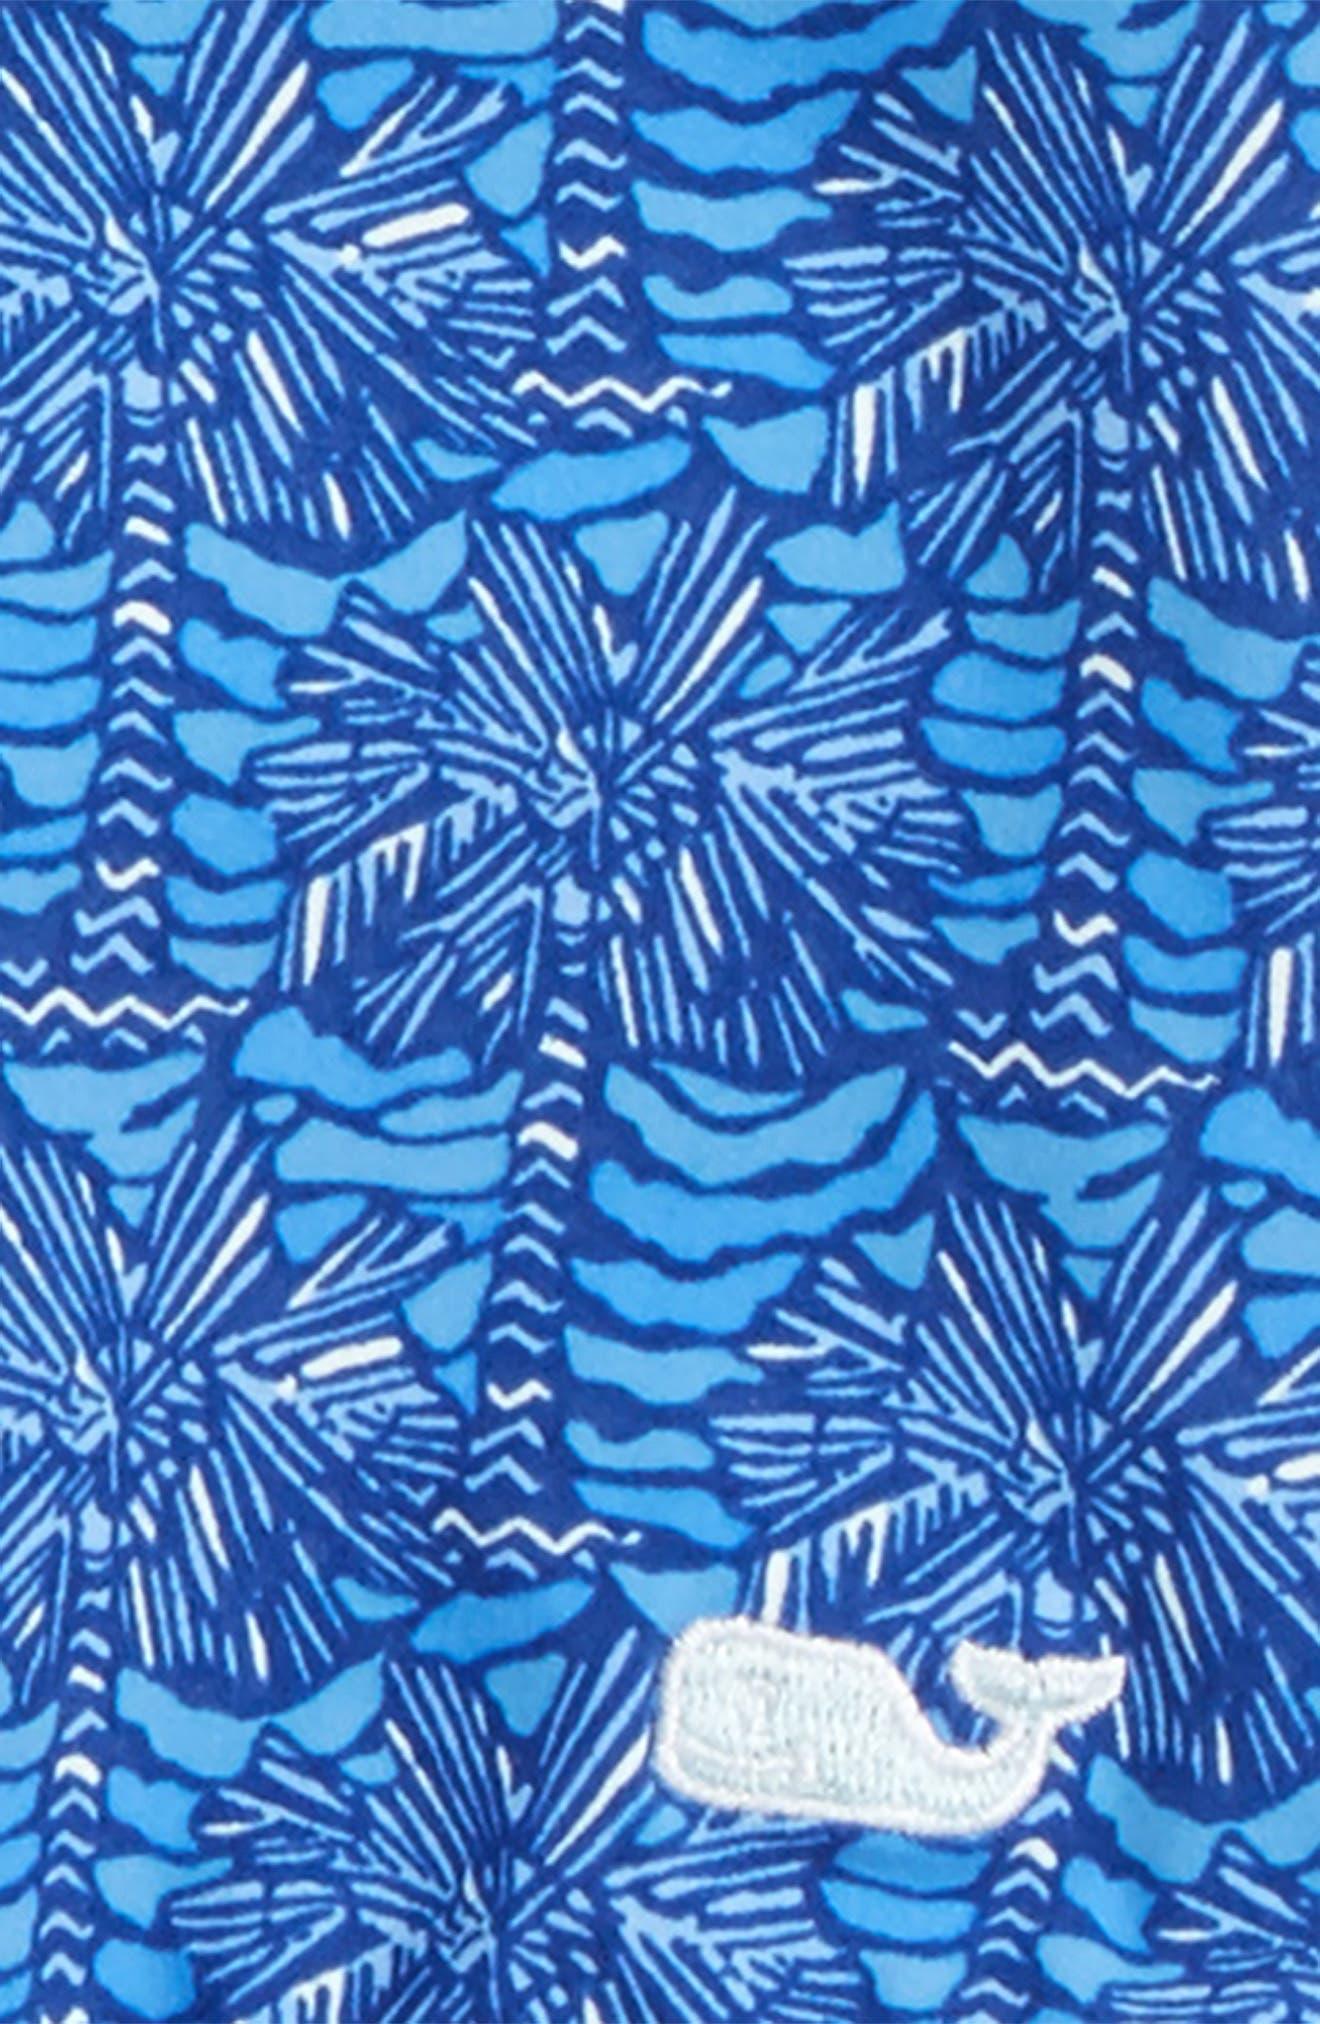 Palmetto Print One-Piece Swimsuit,                             Alternate thumbnail 3, color,                             474